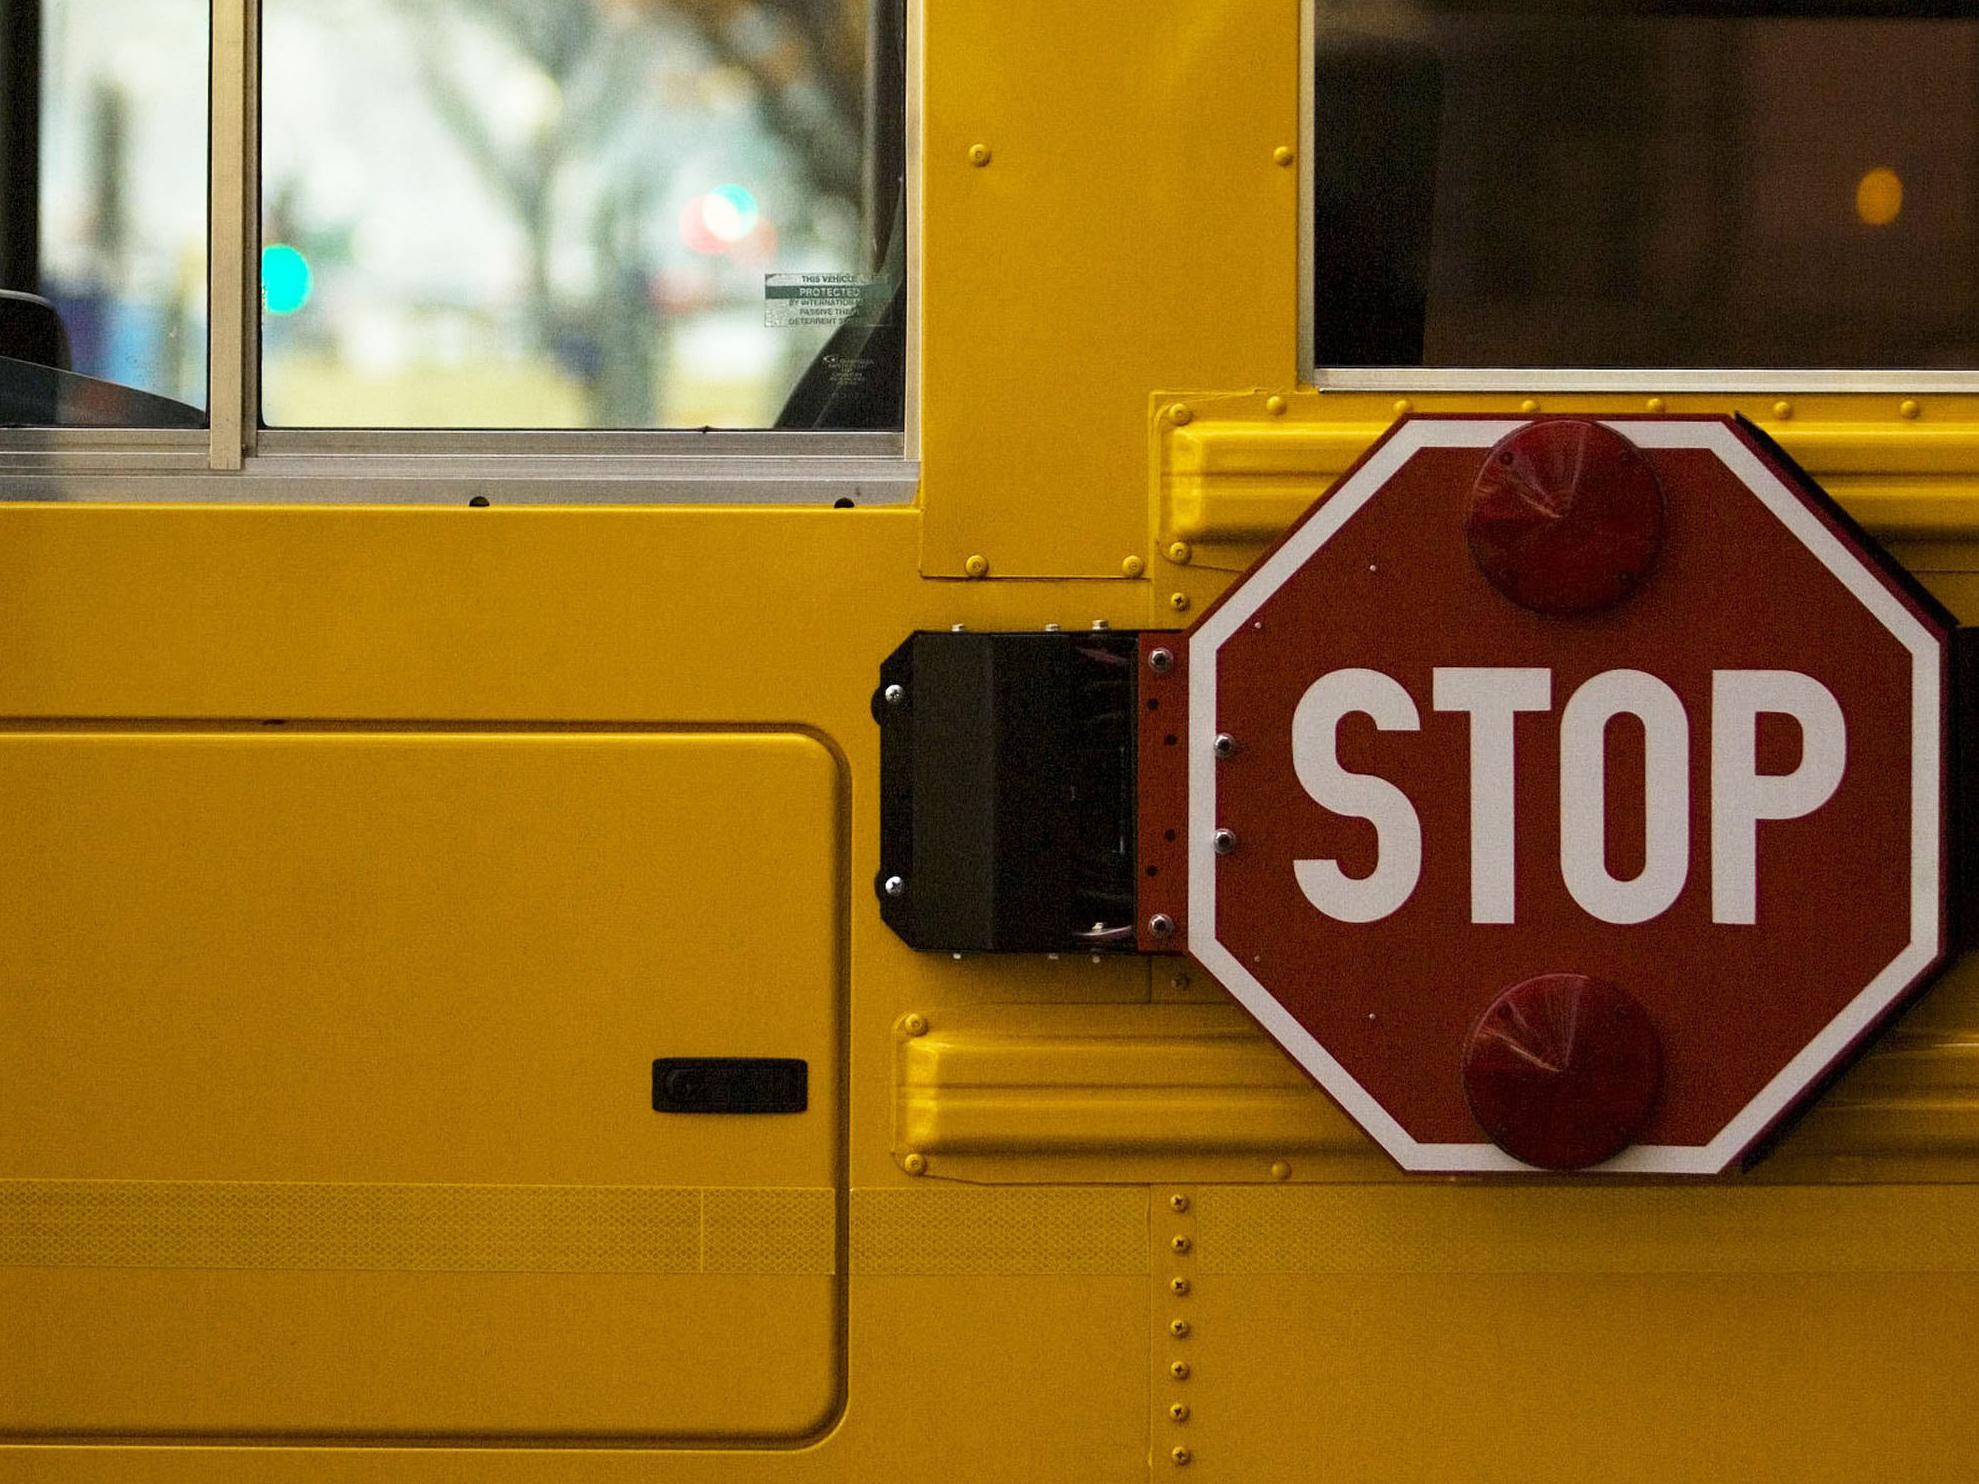 39 children injured in 4-school bus accident in NJ - CBS News